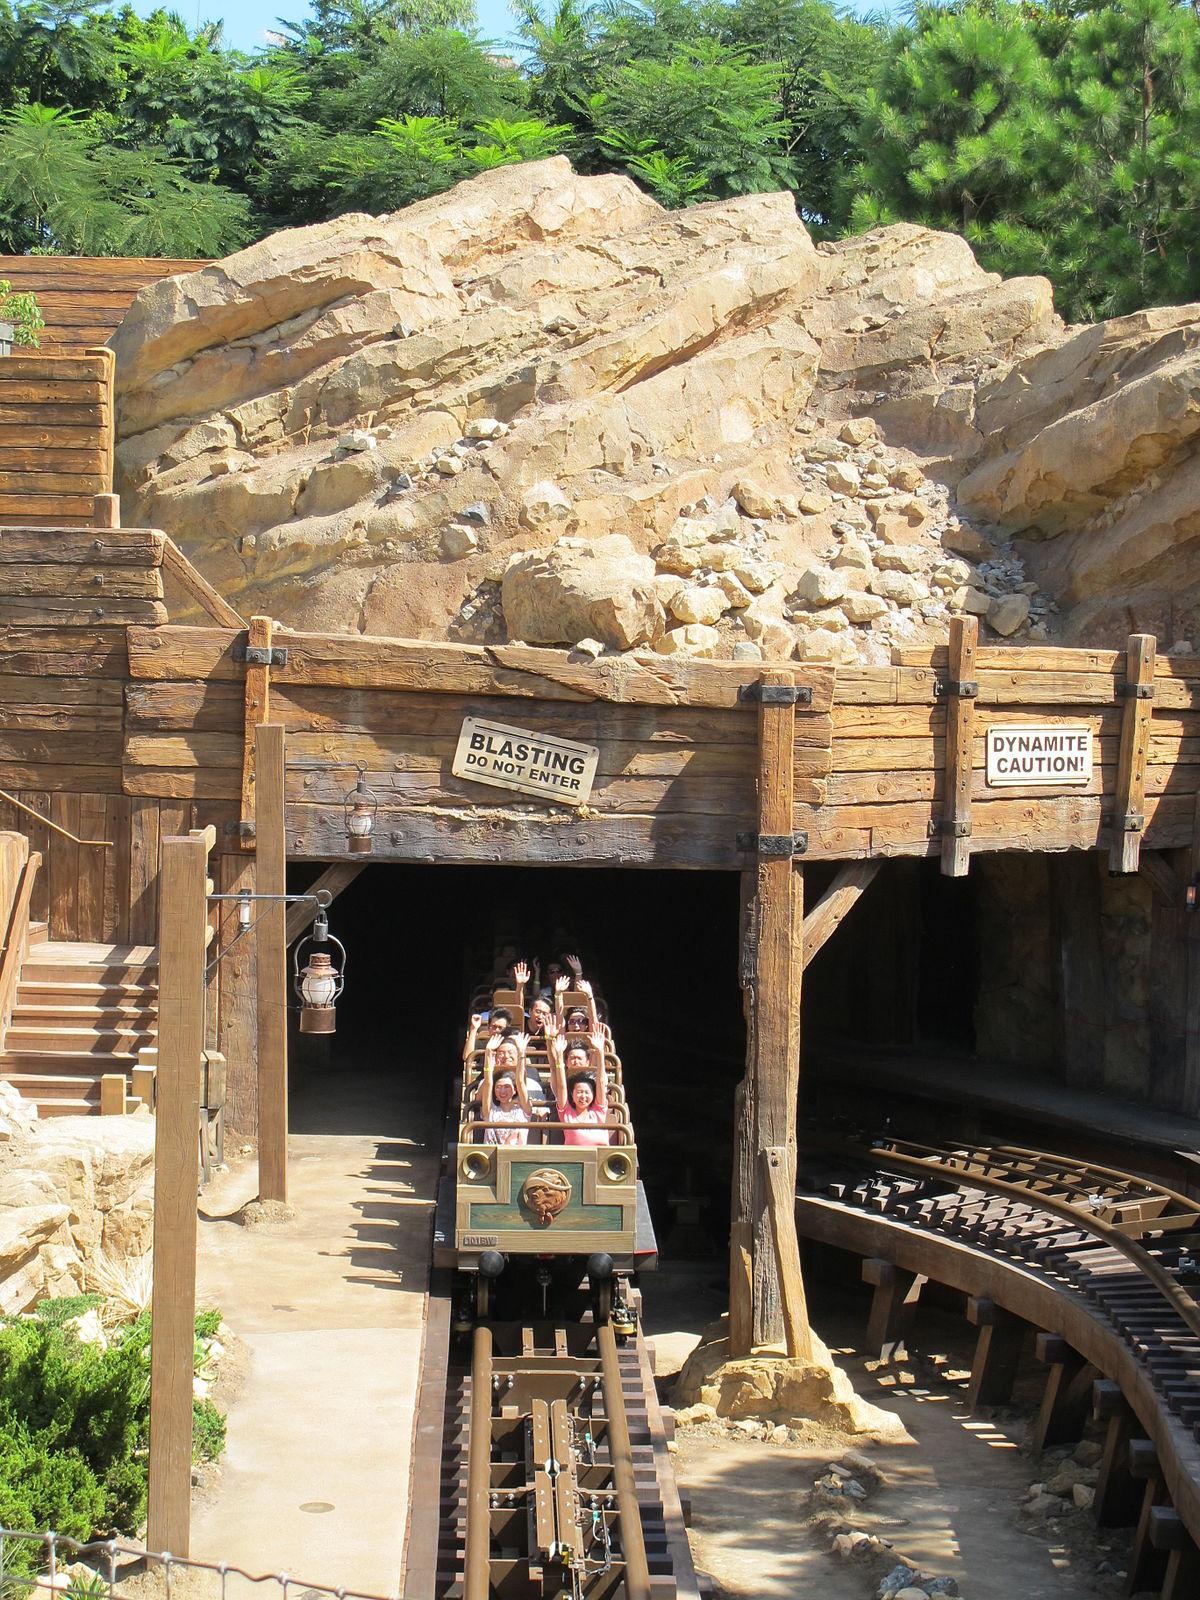 Big Grizzly Mountain Runaway Mine Cars - Wikipedia